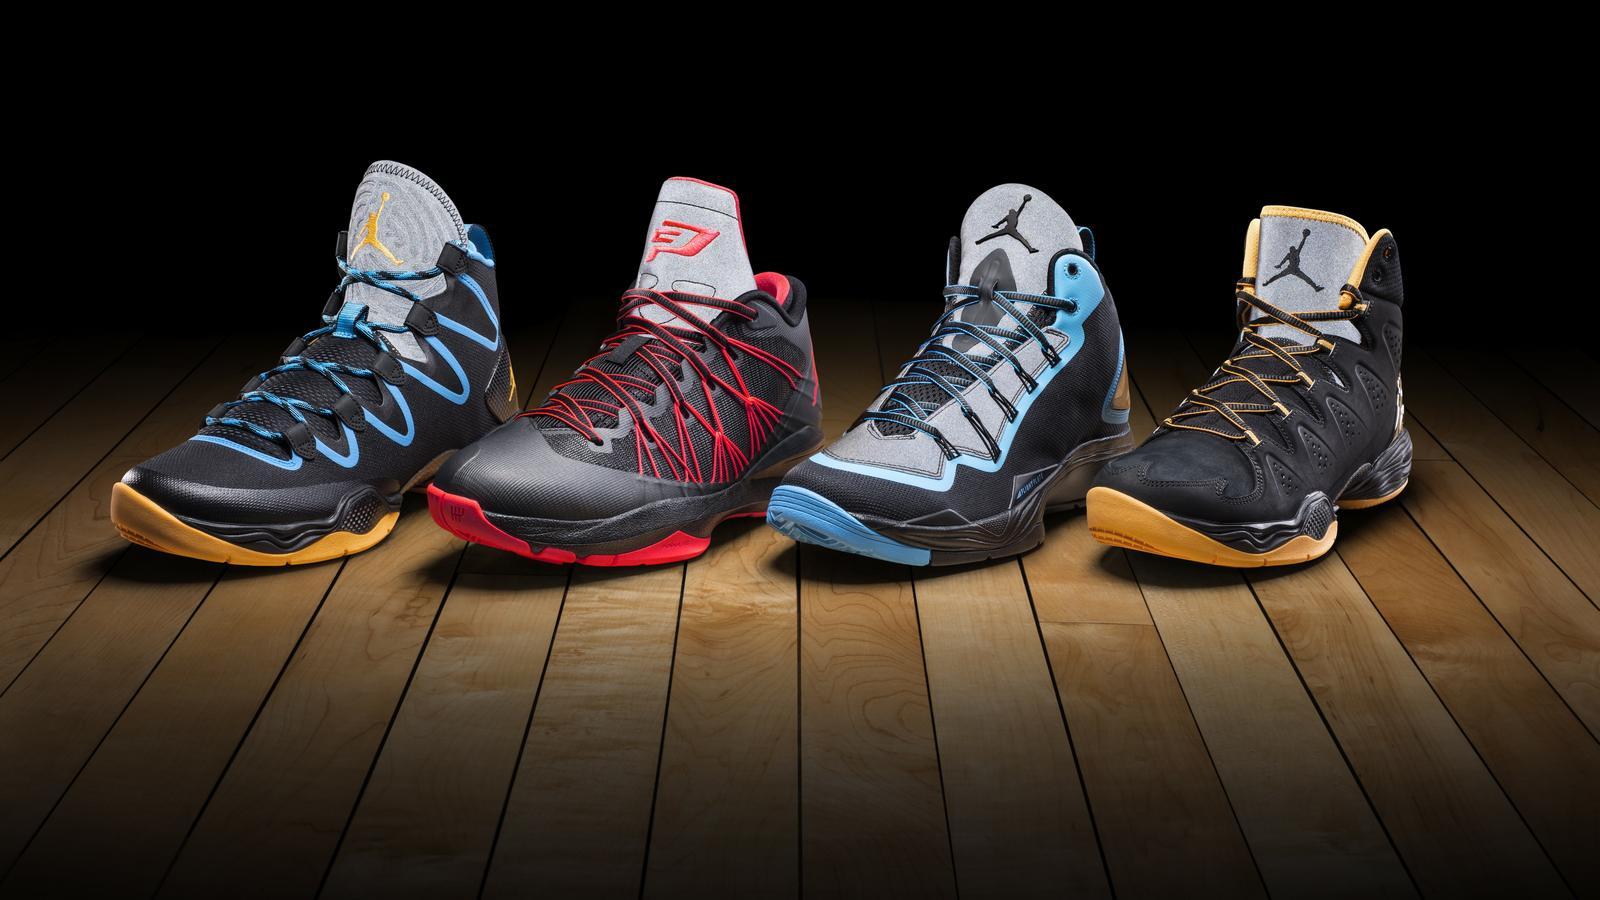 65cb6fbd0c126e Time to Shine  The Jordan Brand Playoff Pack - Nike News